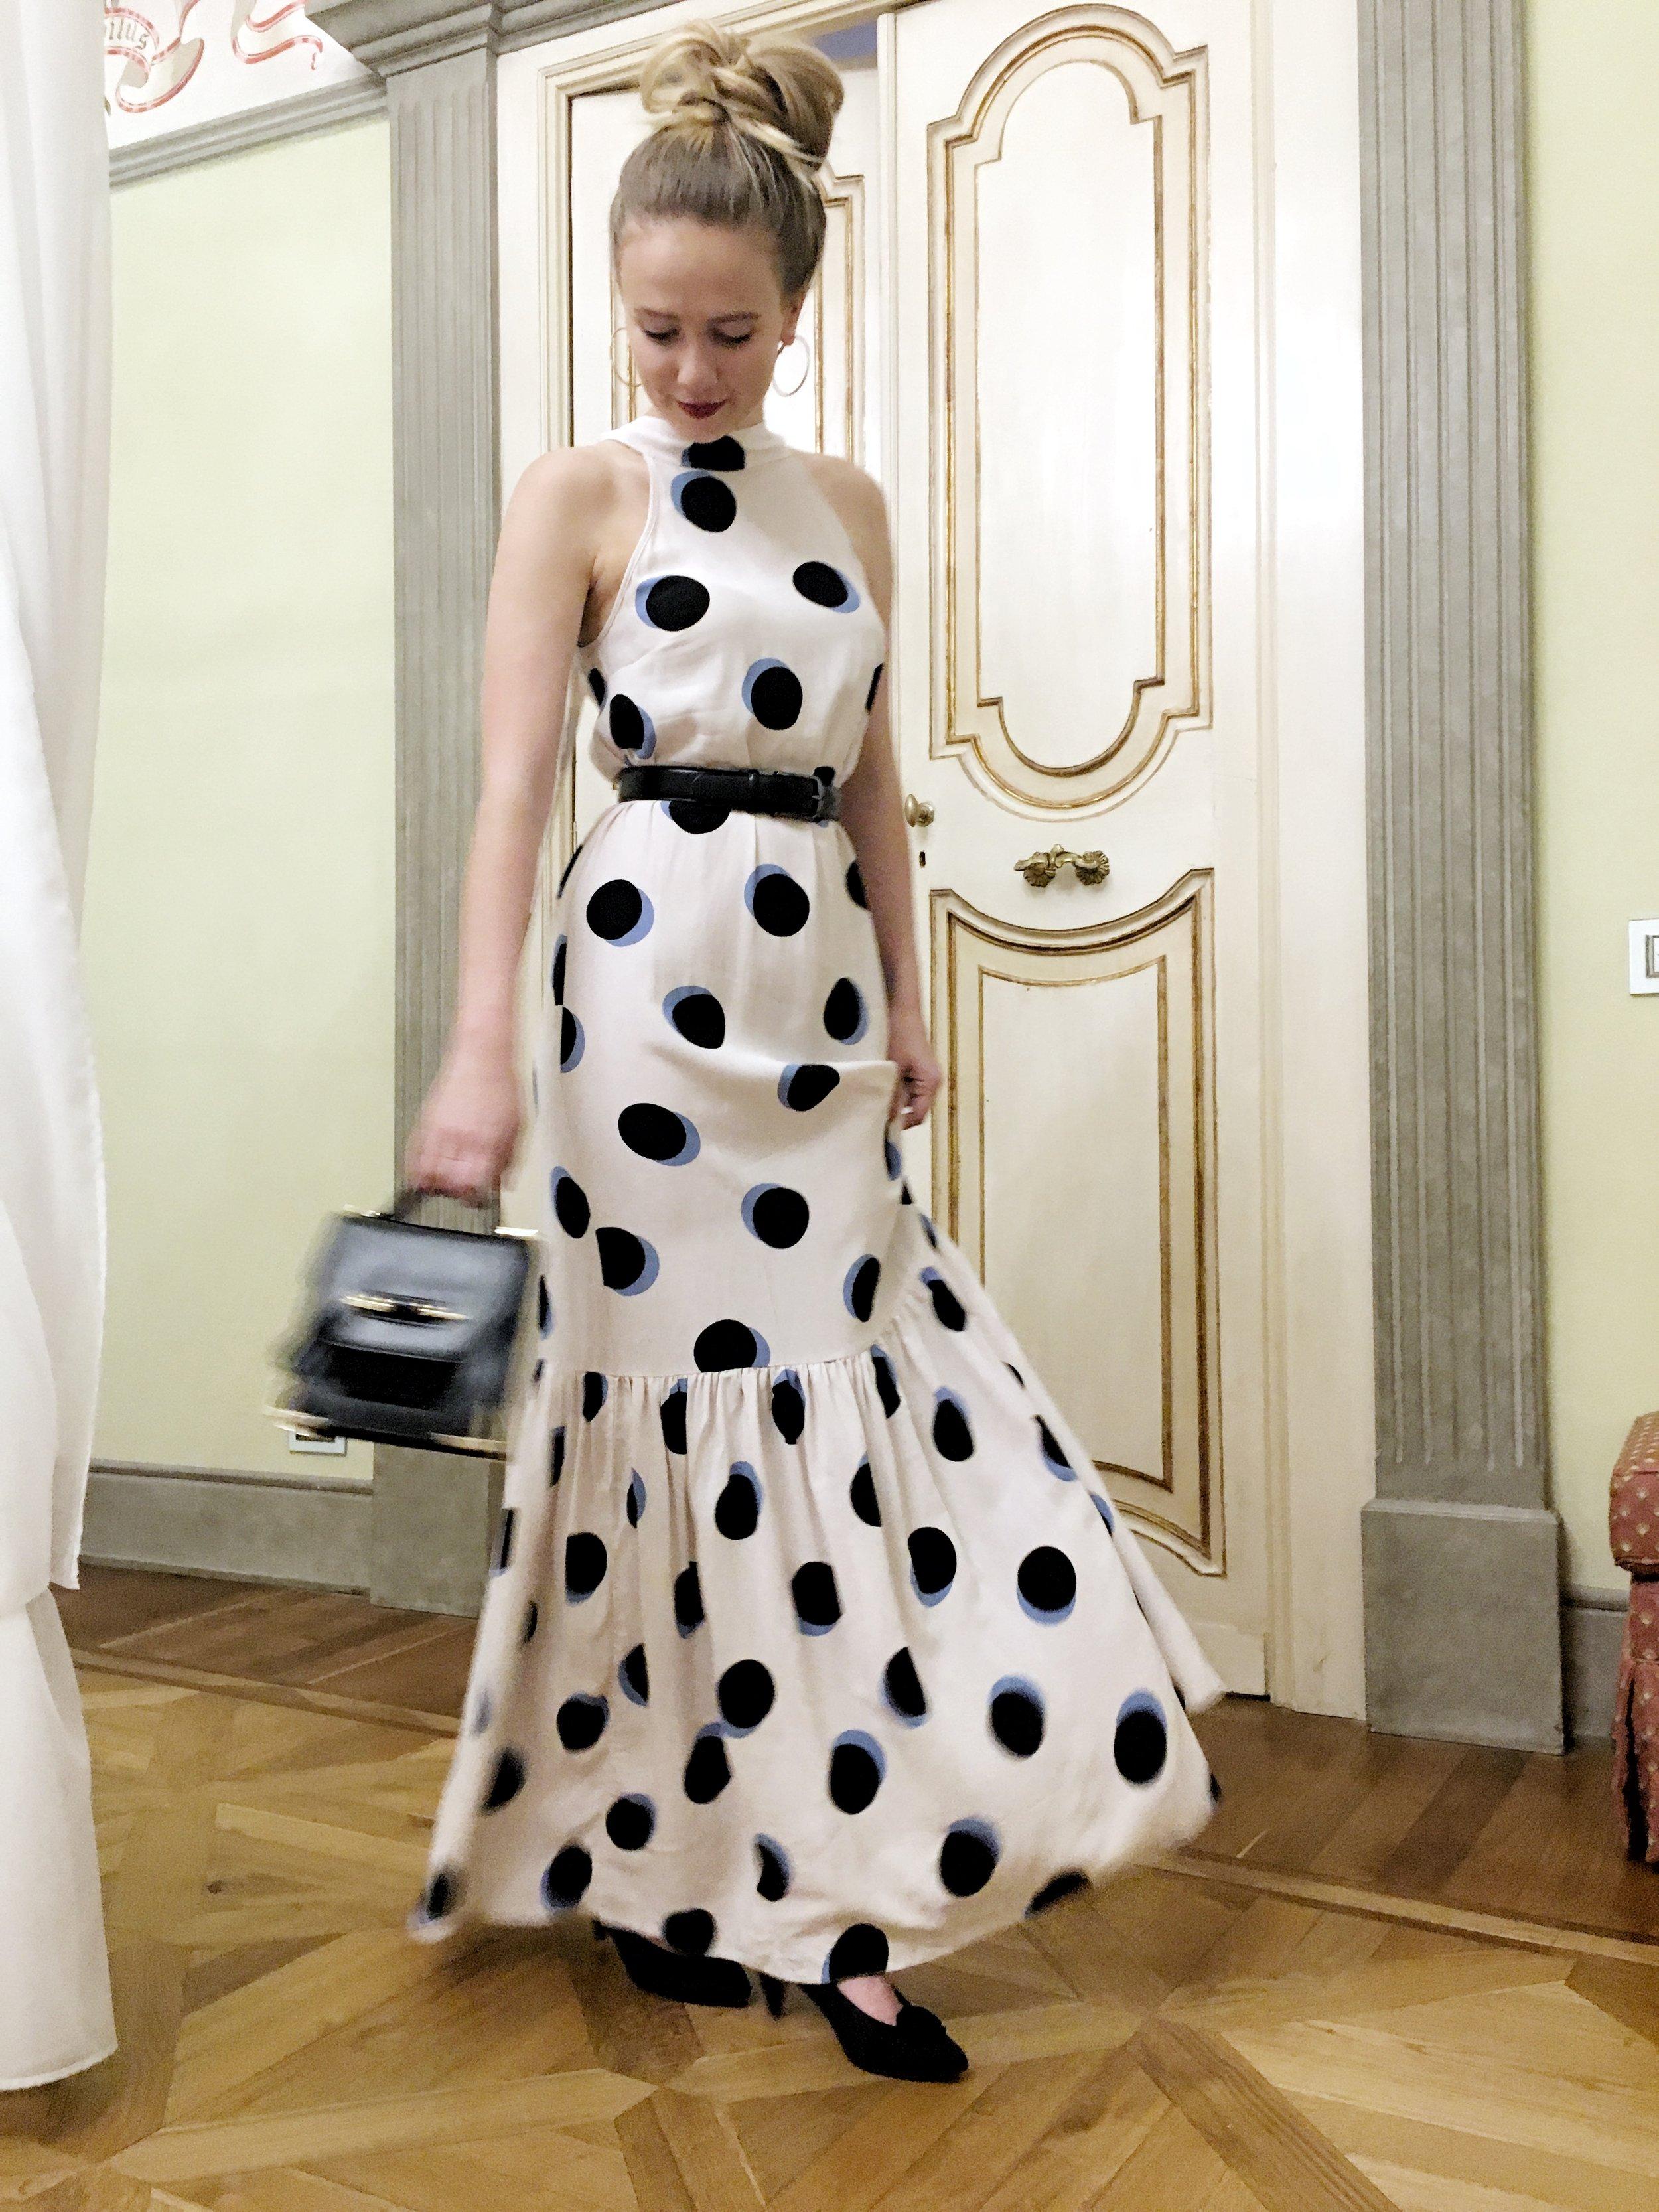 ASOS dot maxi dress, House of Mackage bag, vintage heels